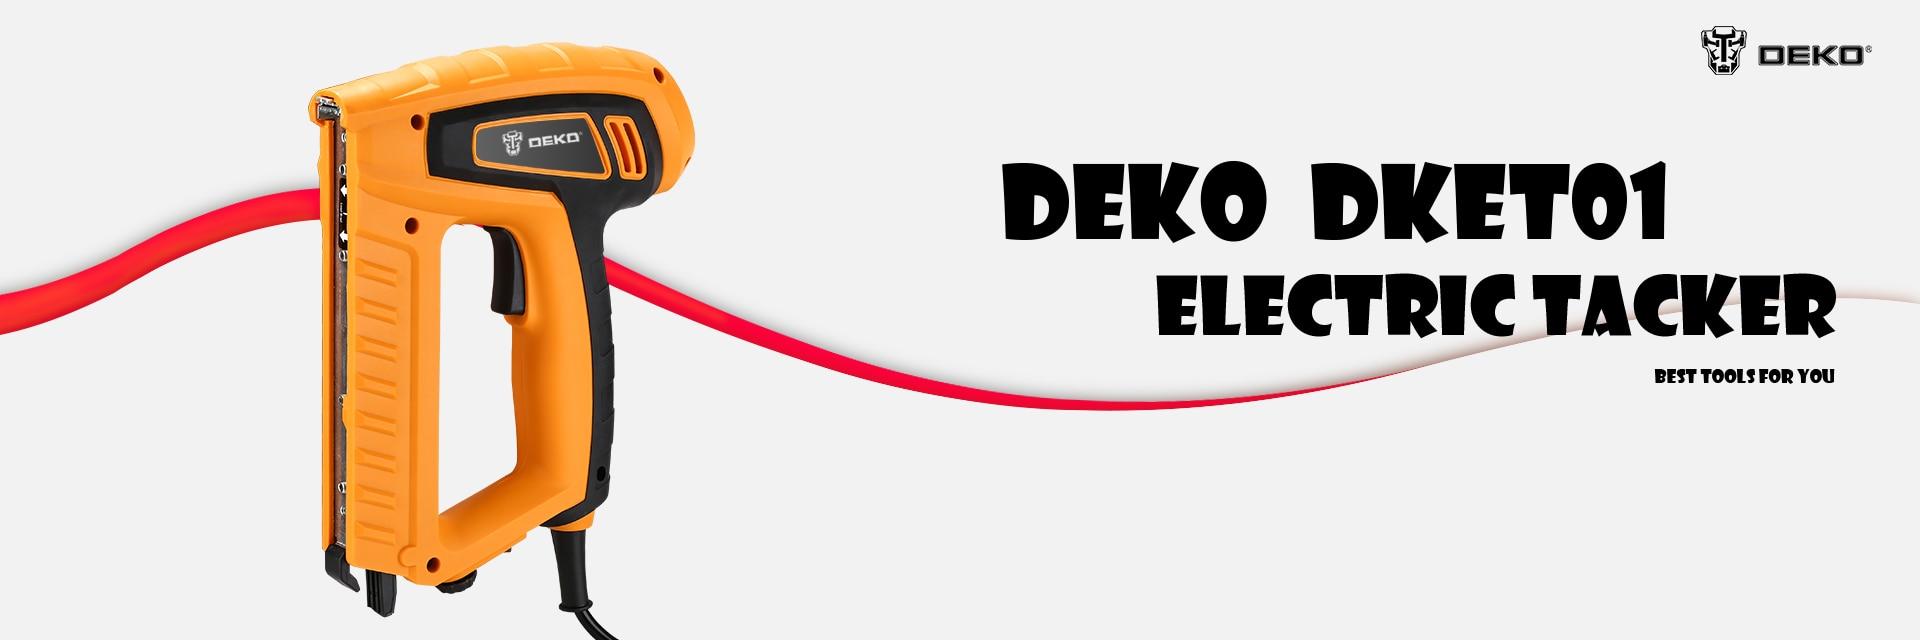 Pistola clavadora eléctrica DEKO nuevo DKET01 220V 20 pzas/min